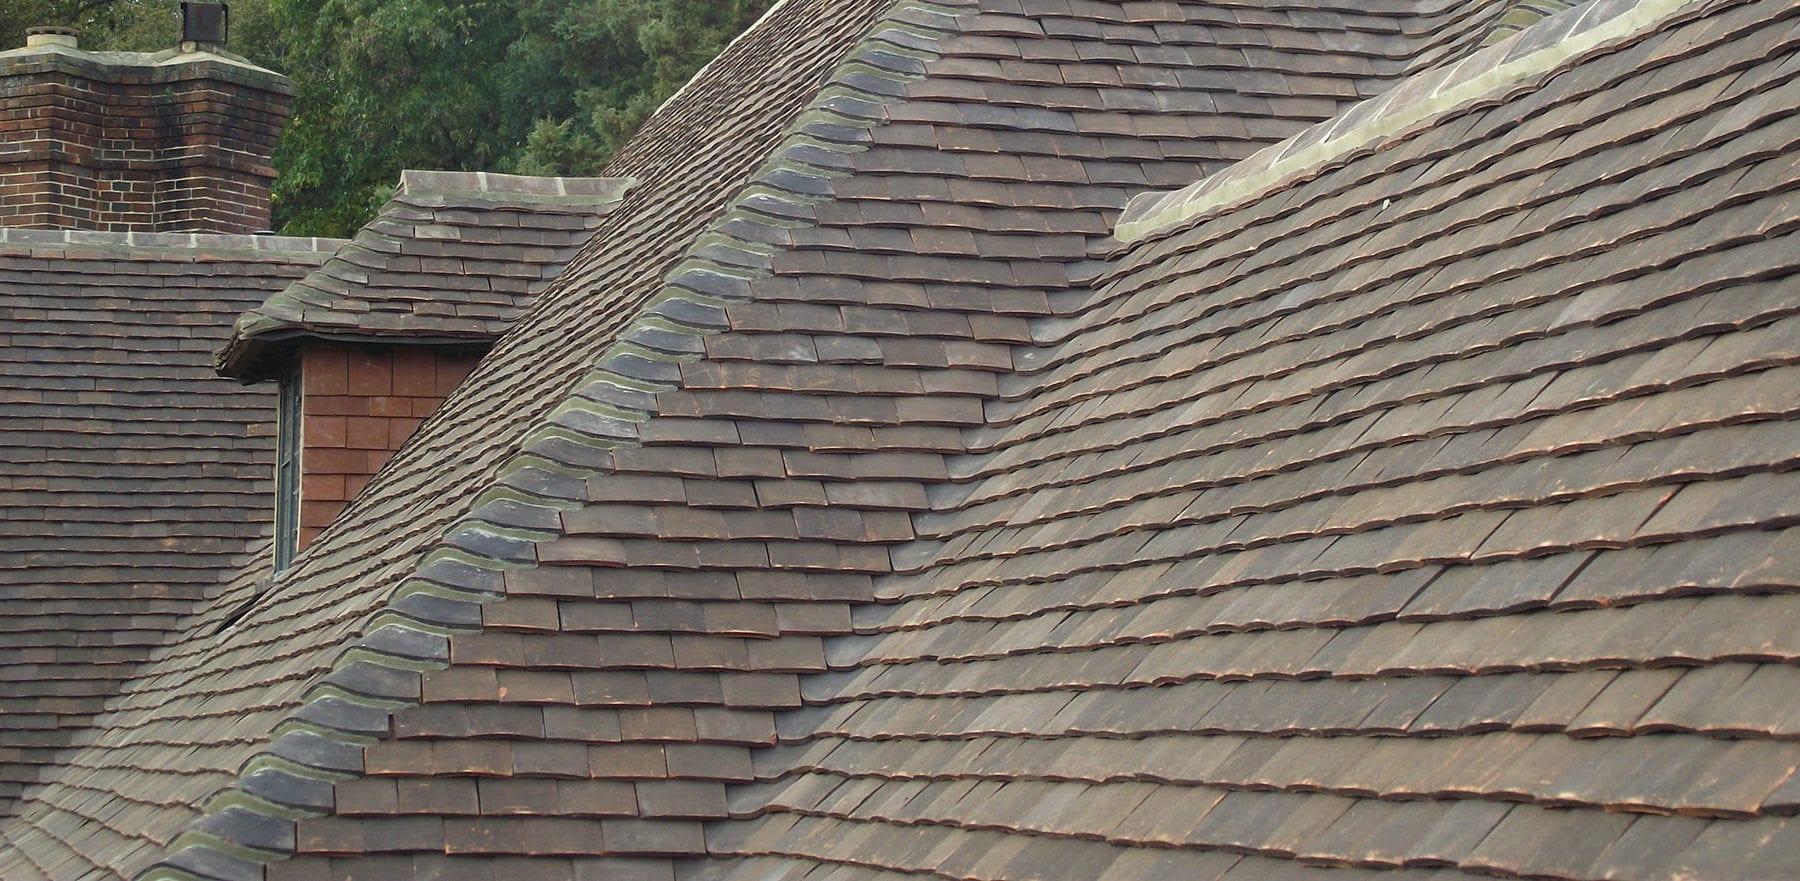 Lifestiles - Handmade Restoration Clay Roof Tiles - Dorking, England 5